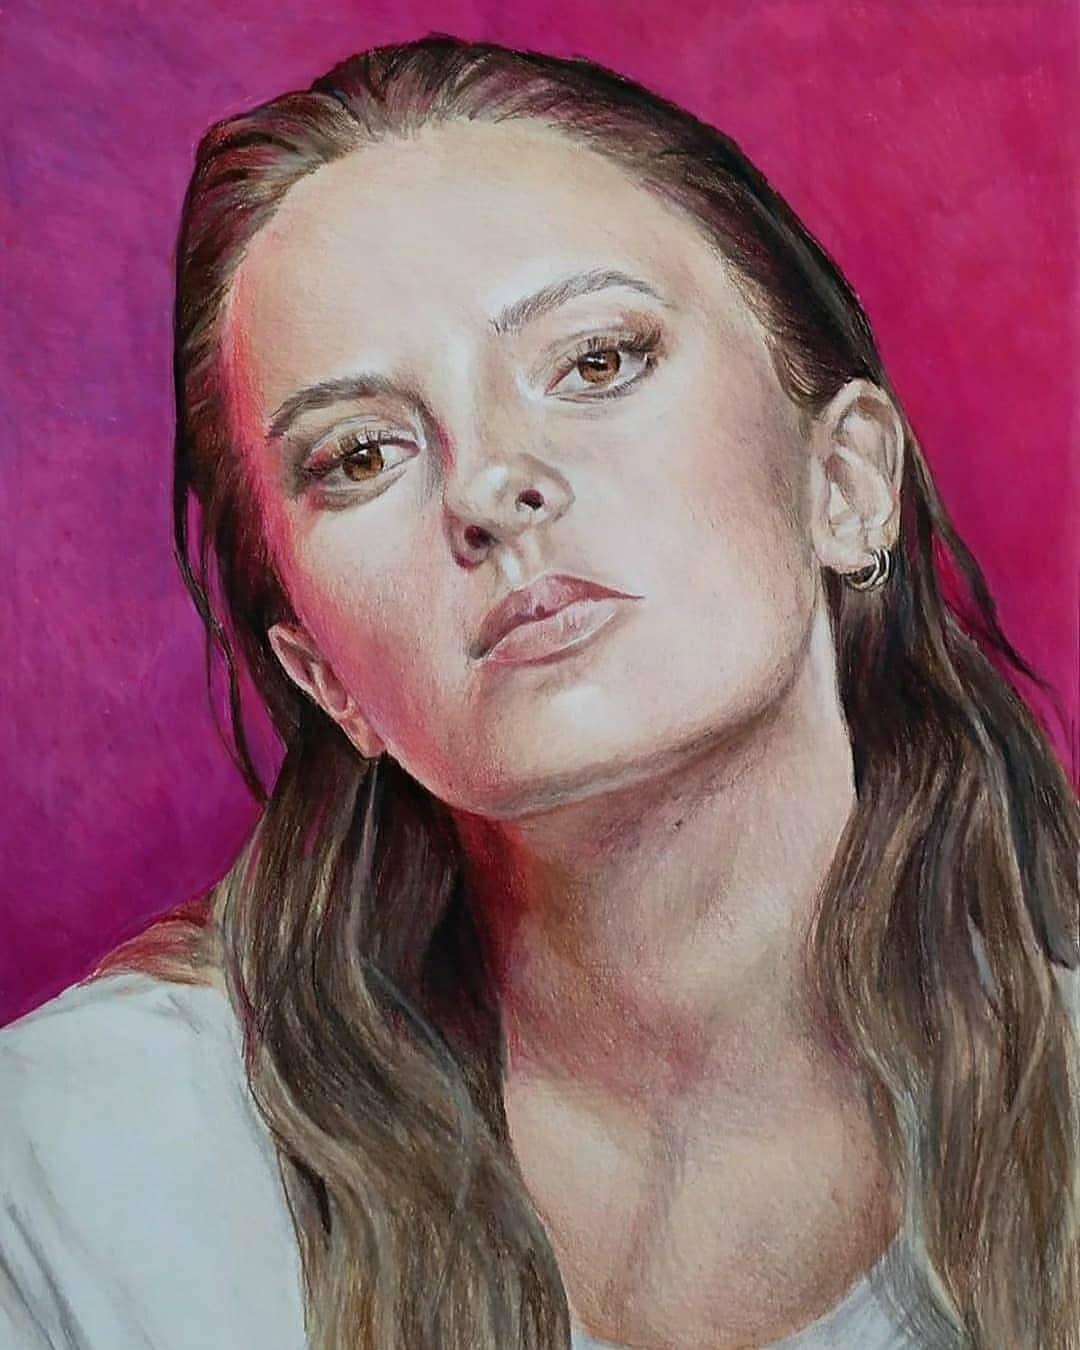 Colored pencil drawing of Francesca Michielin